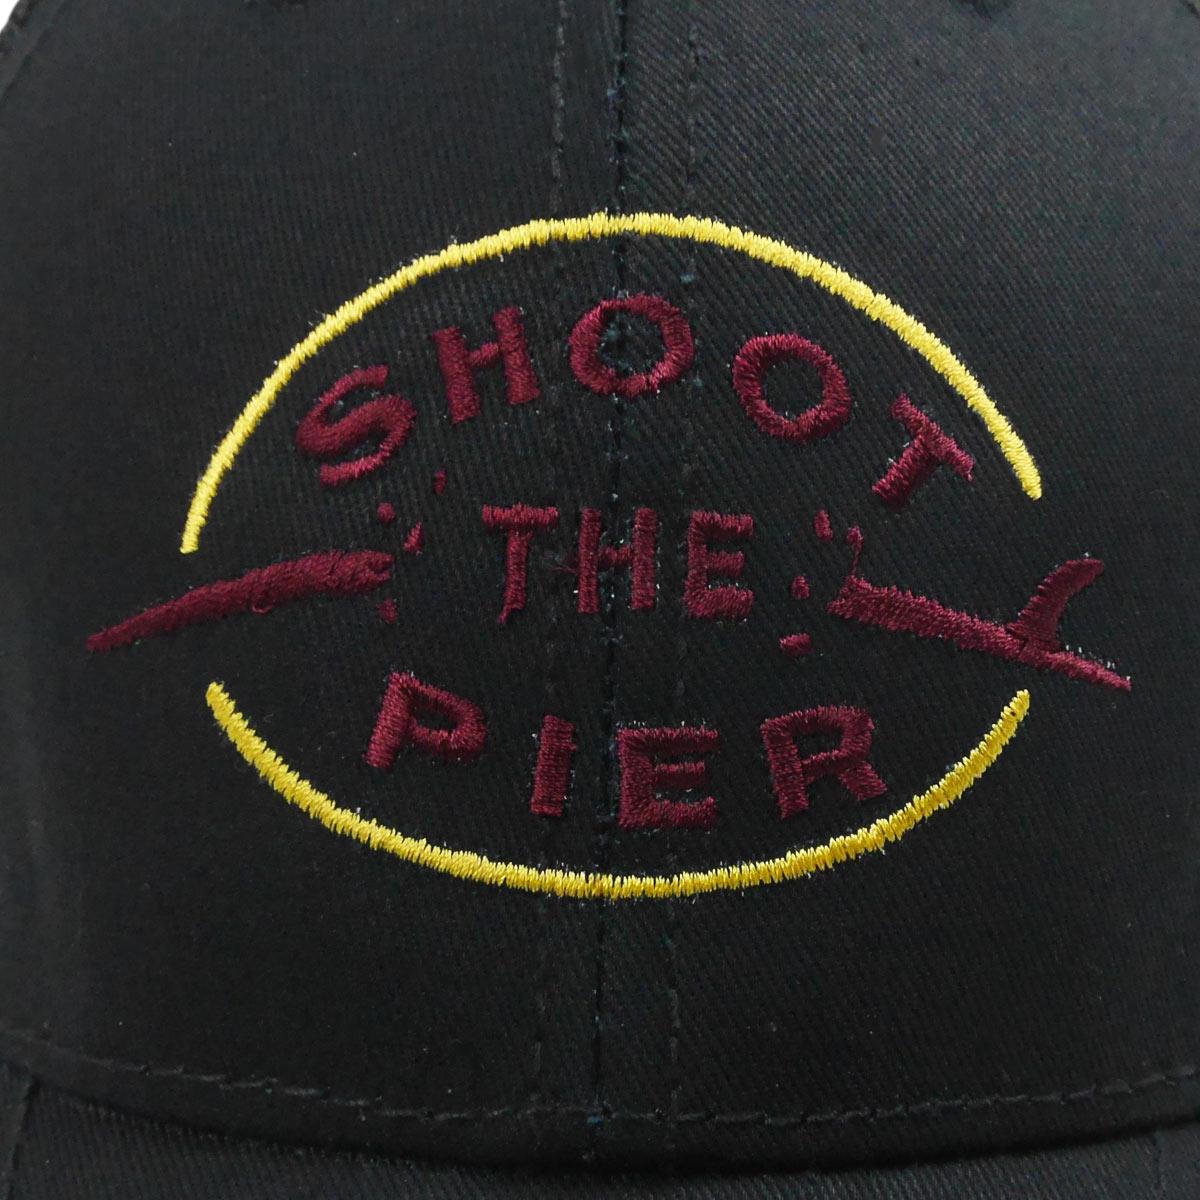 Almond Surf アーモンドサーフボードデザイン SHOOT PIER CAP